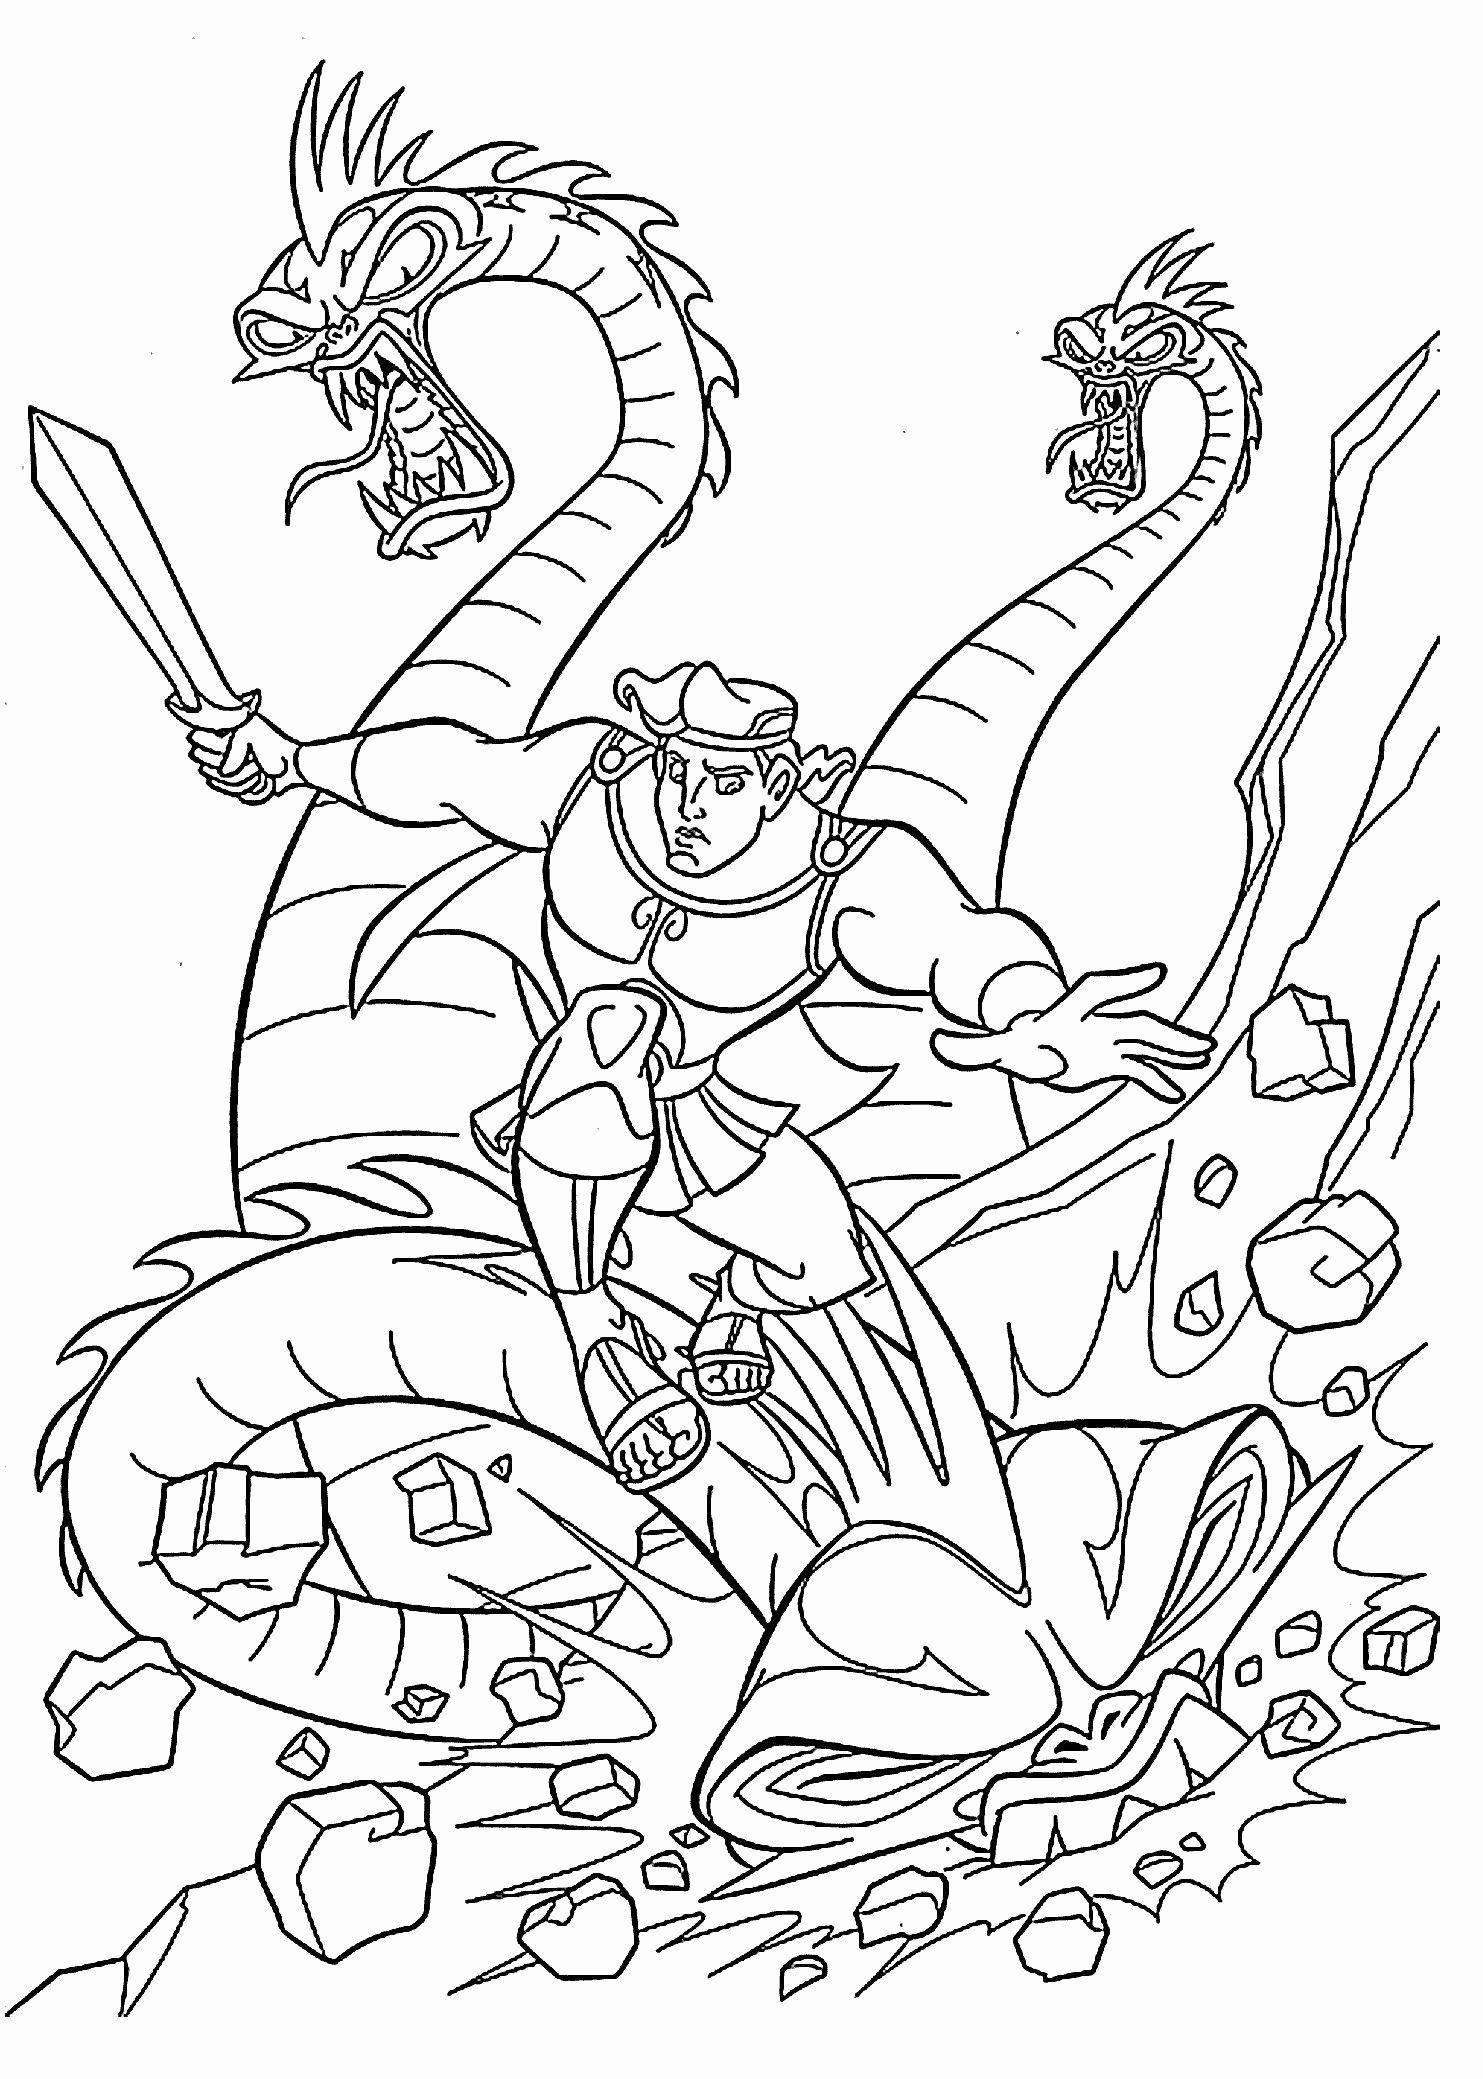 Unicorn Coloring Pages Free Printable Fresh Elegant Dragon